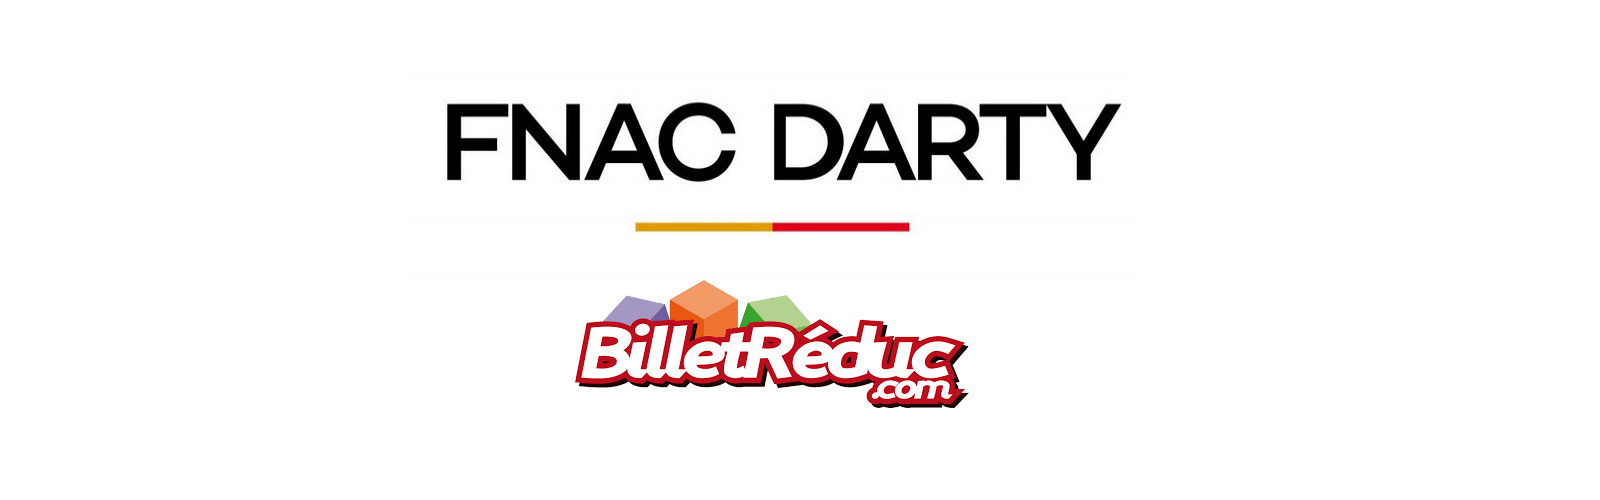 fnac-darty-billetreduc